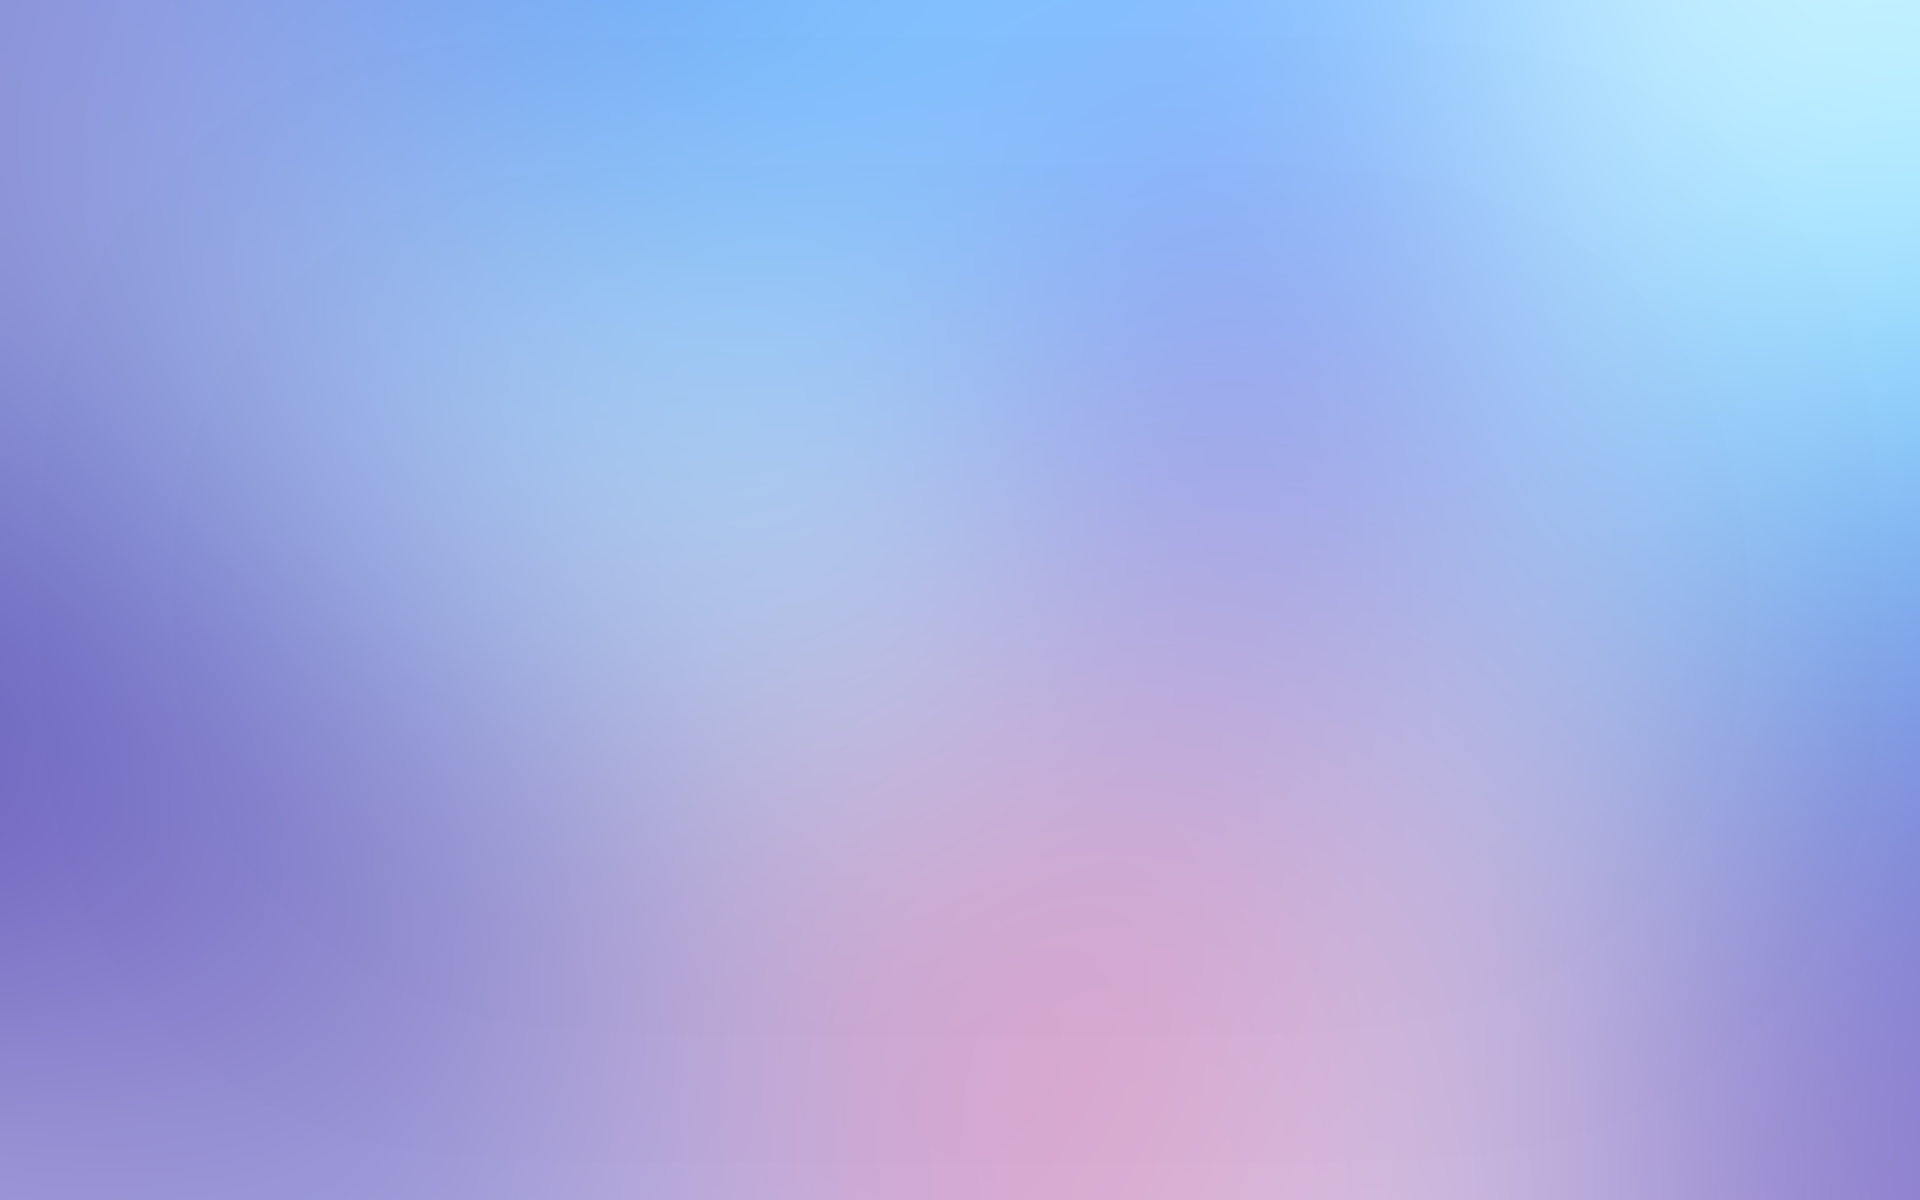 15 excellent hd gradient wallpapers - Color gradation wallpaper ...